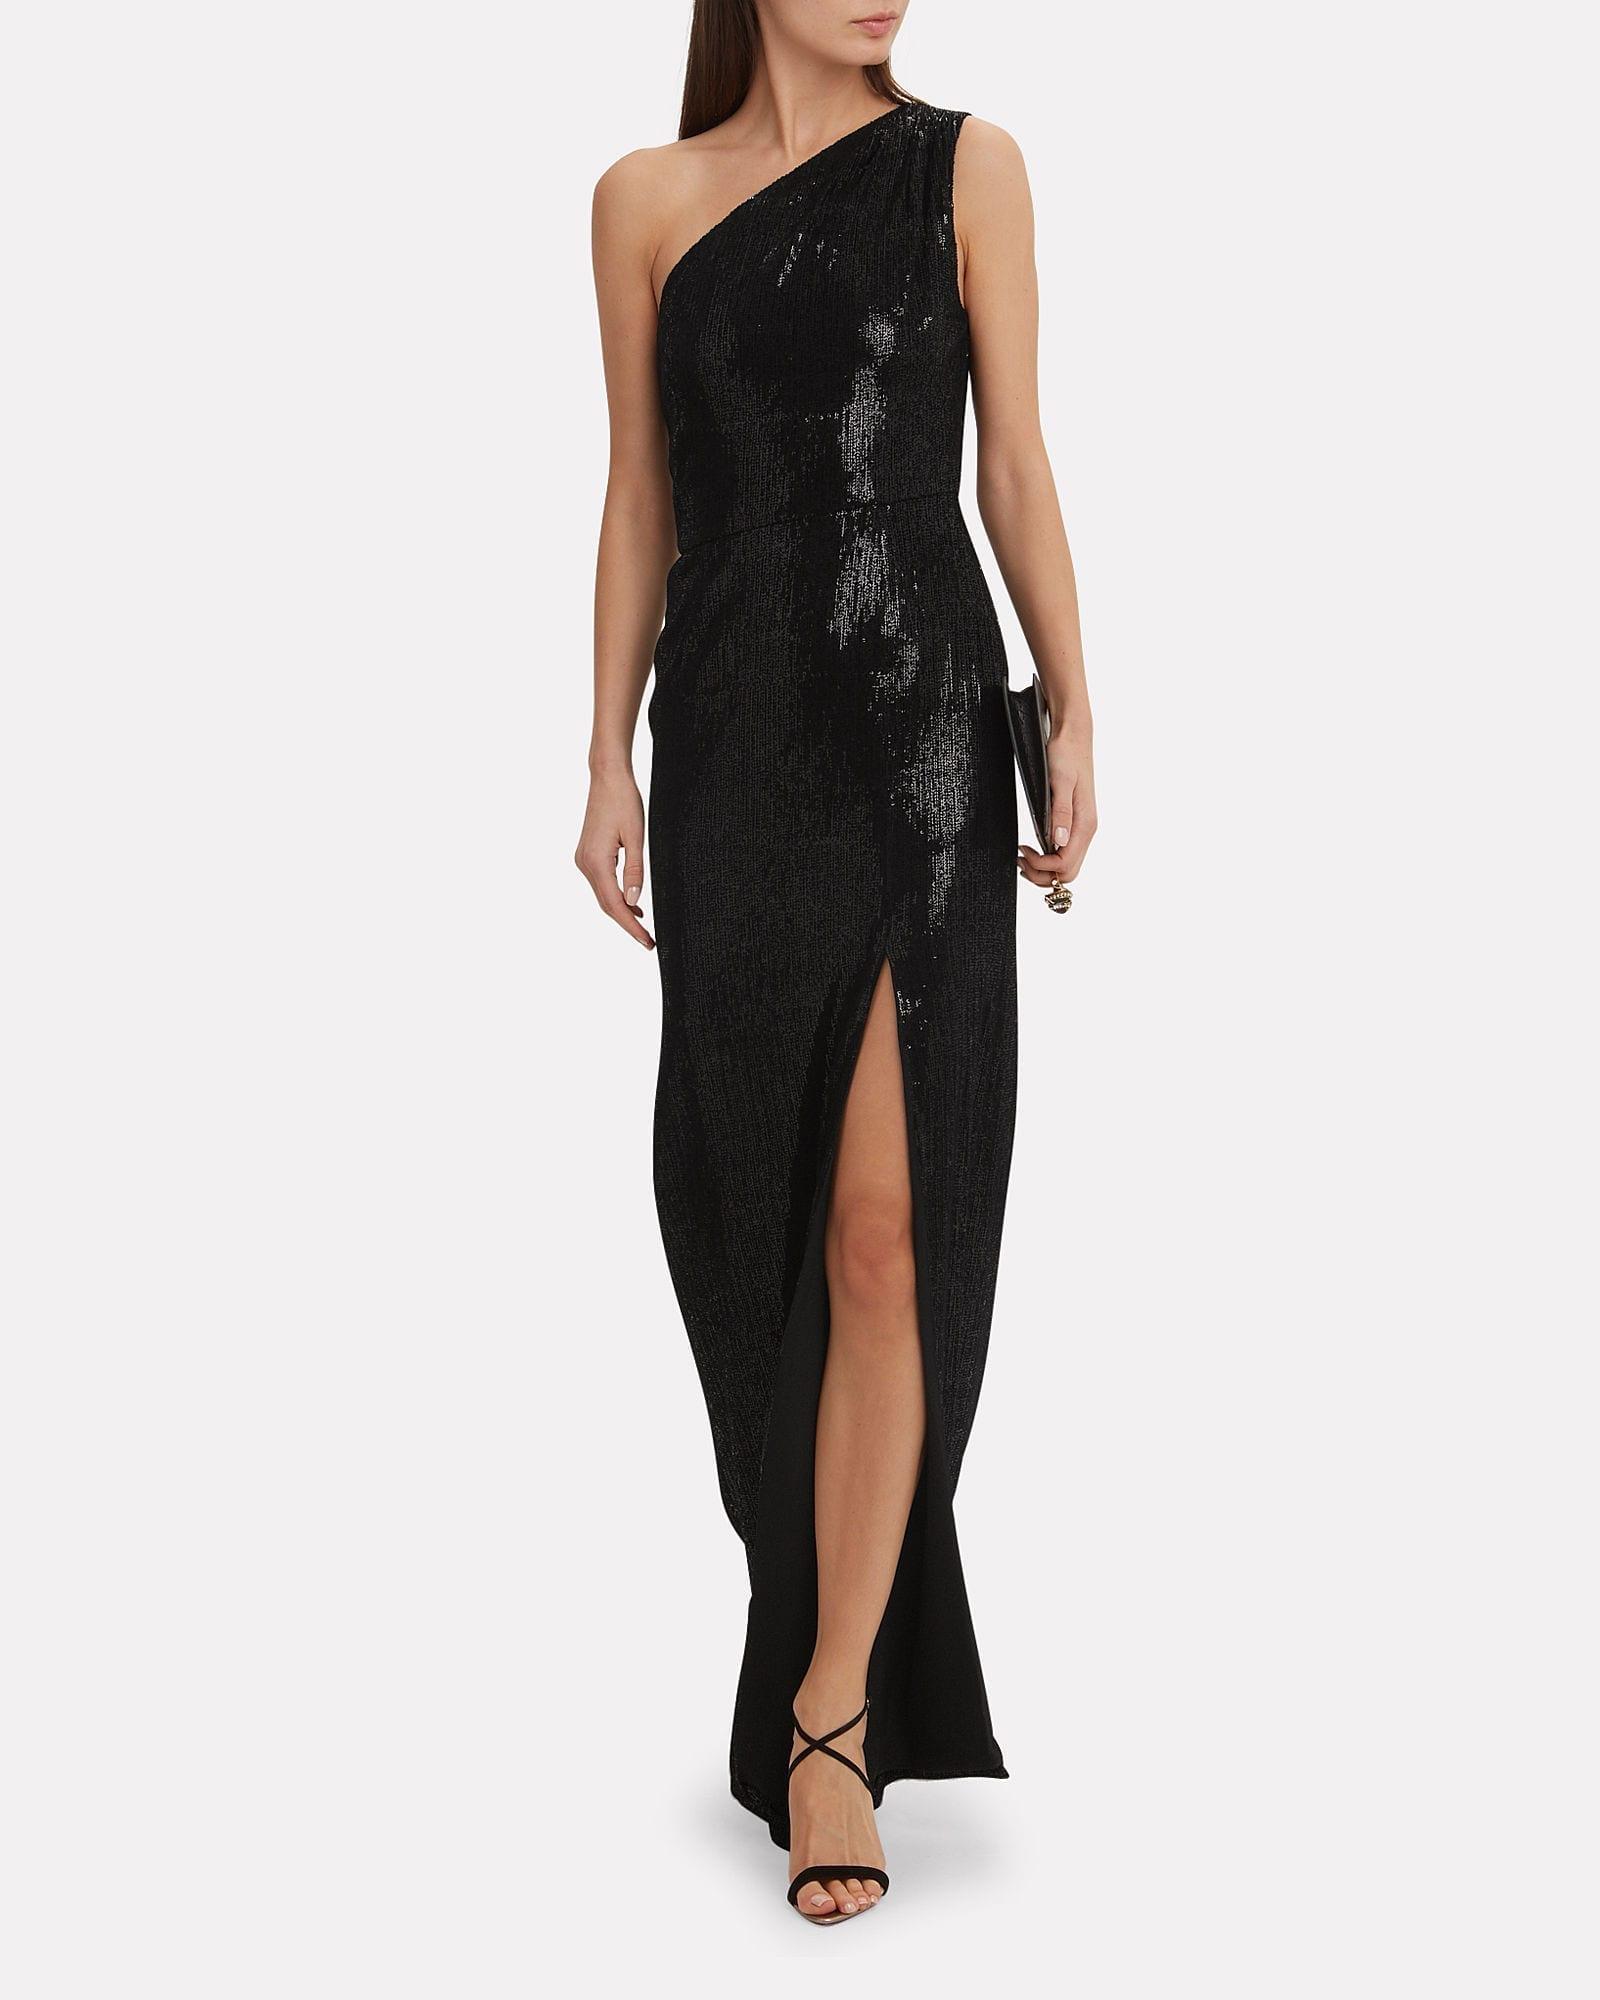 HANEY Zane One Shoulder Sequin Black Gown